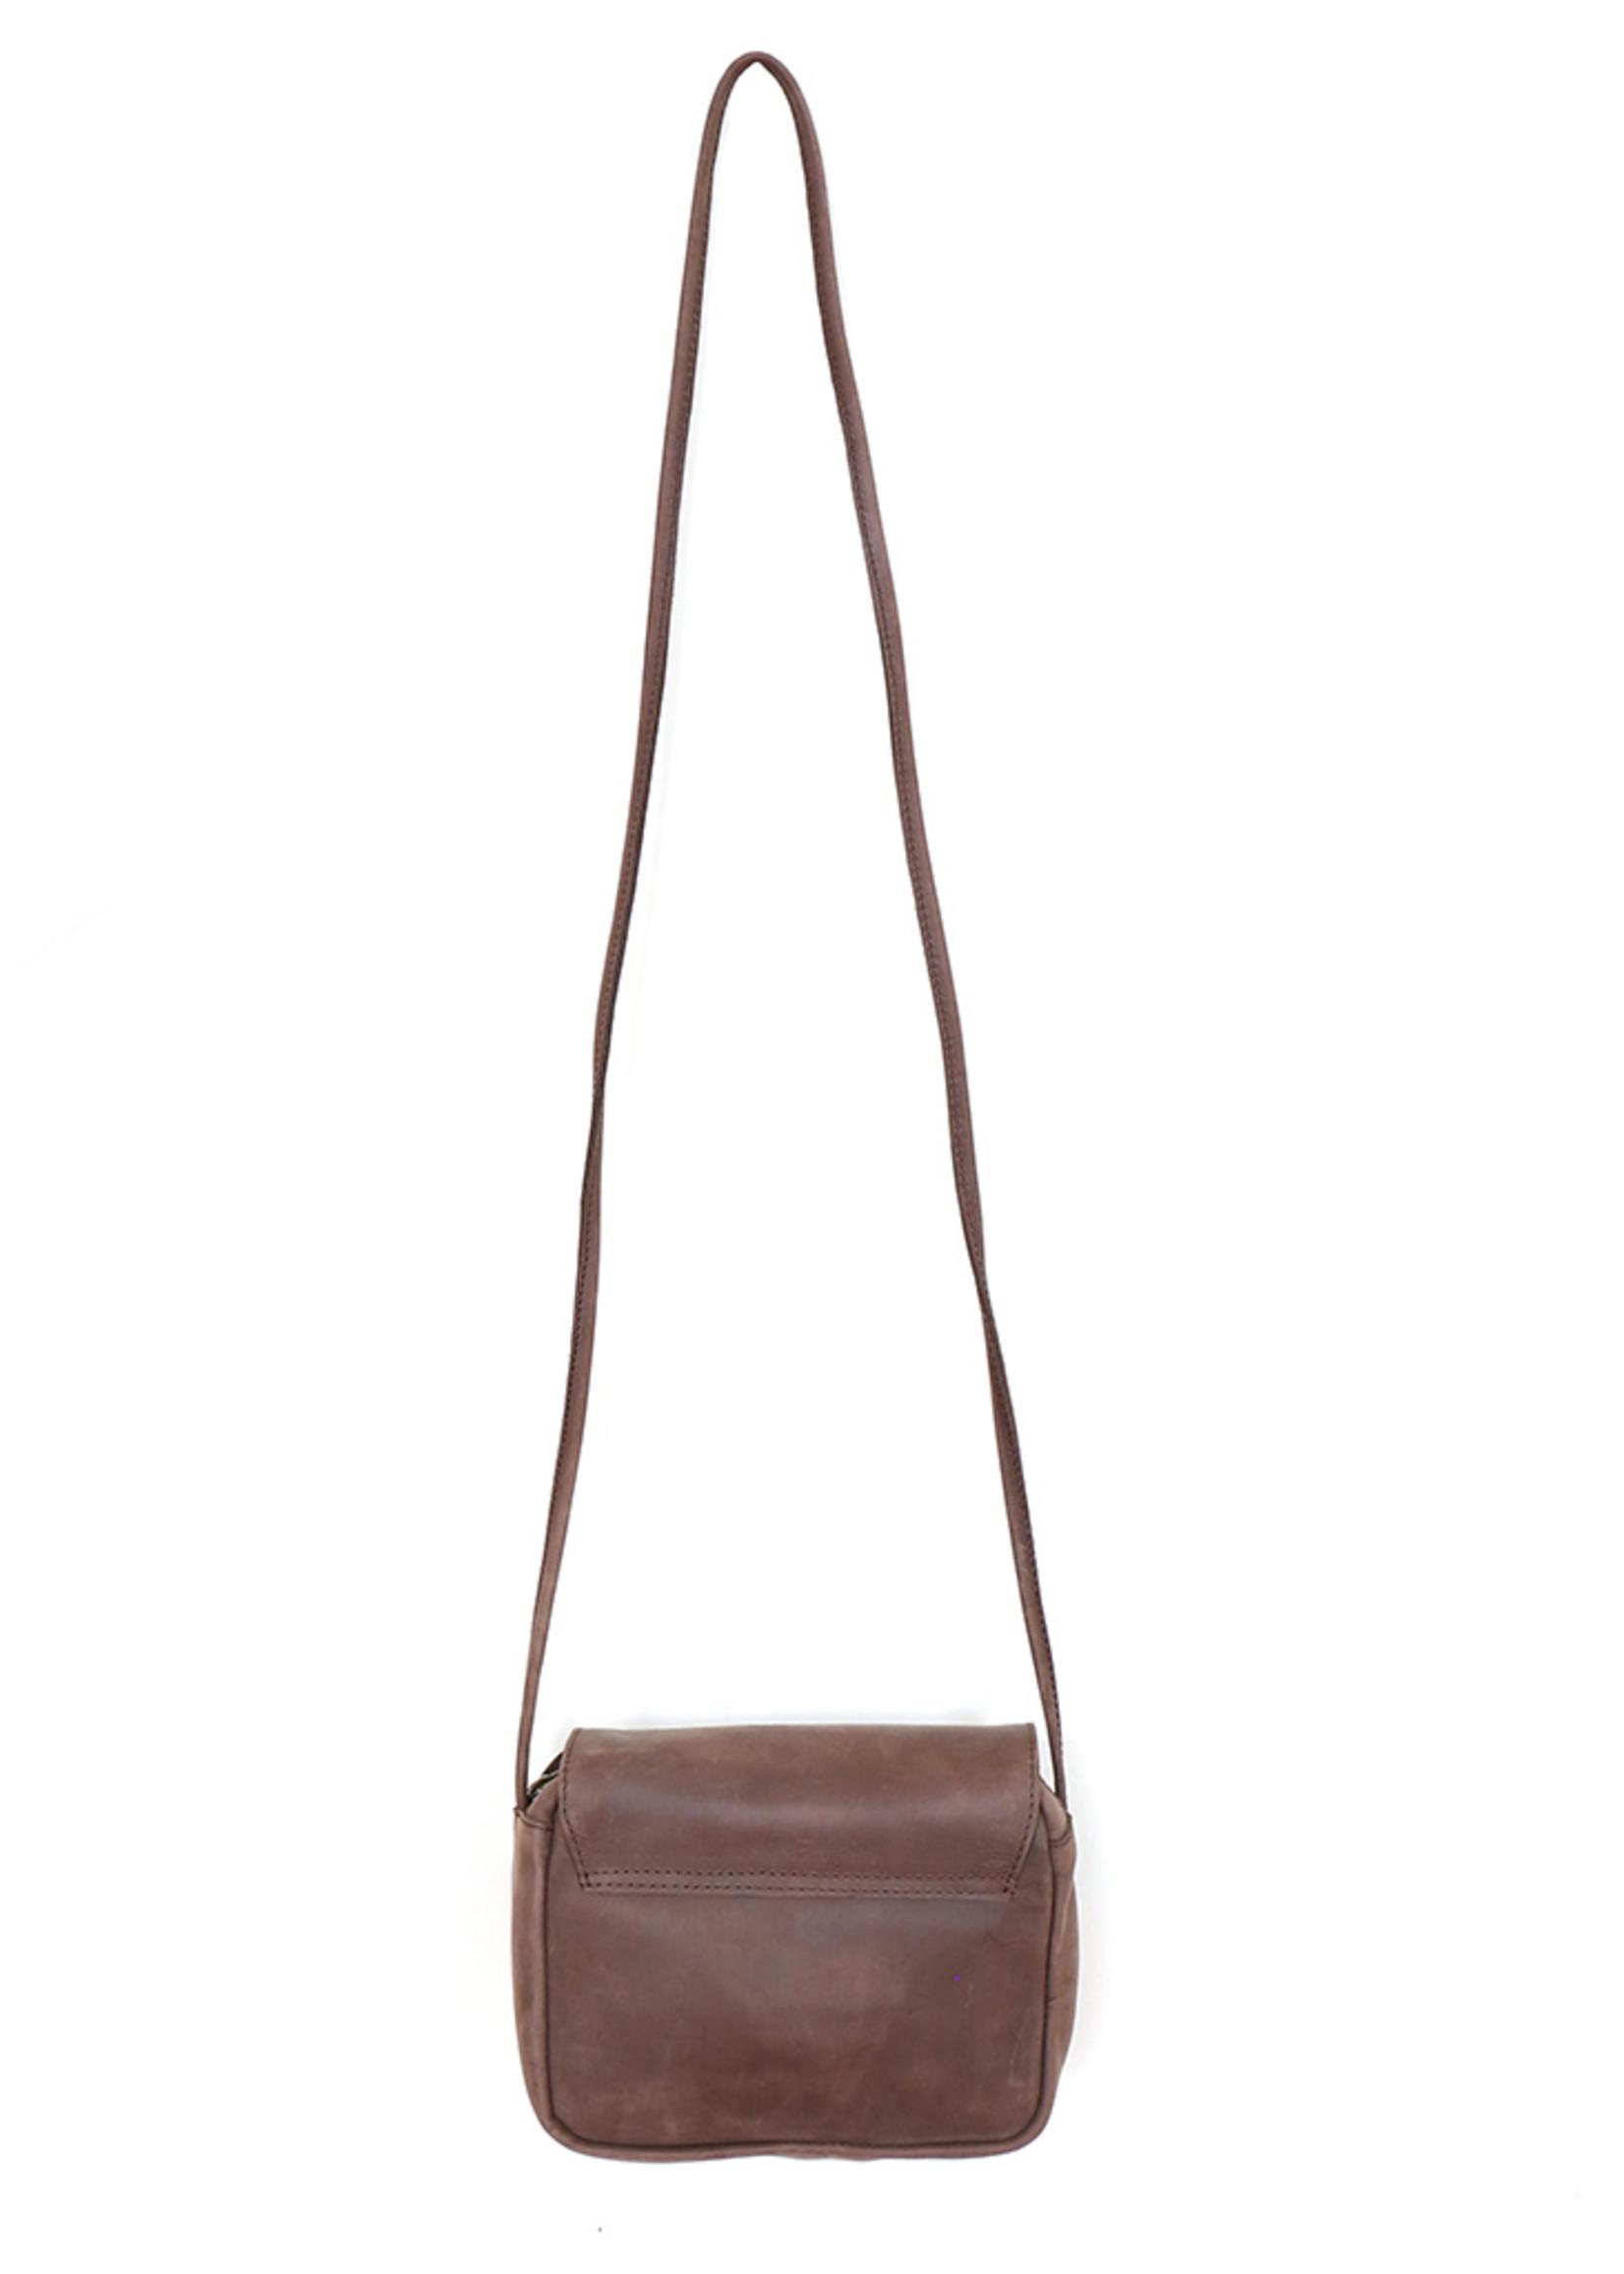 Roam Chocolate Leather Crossbody Purse